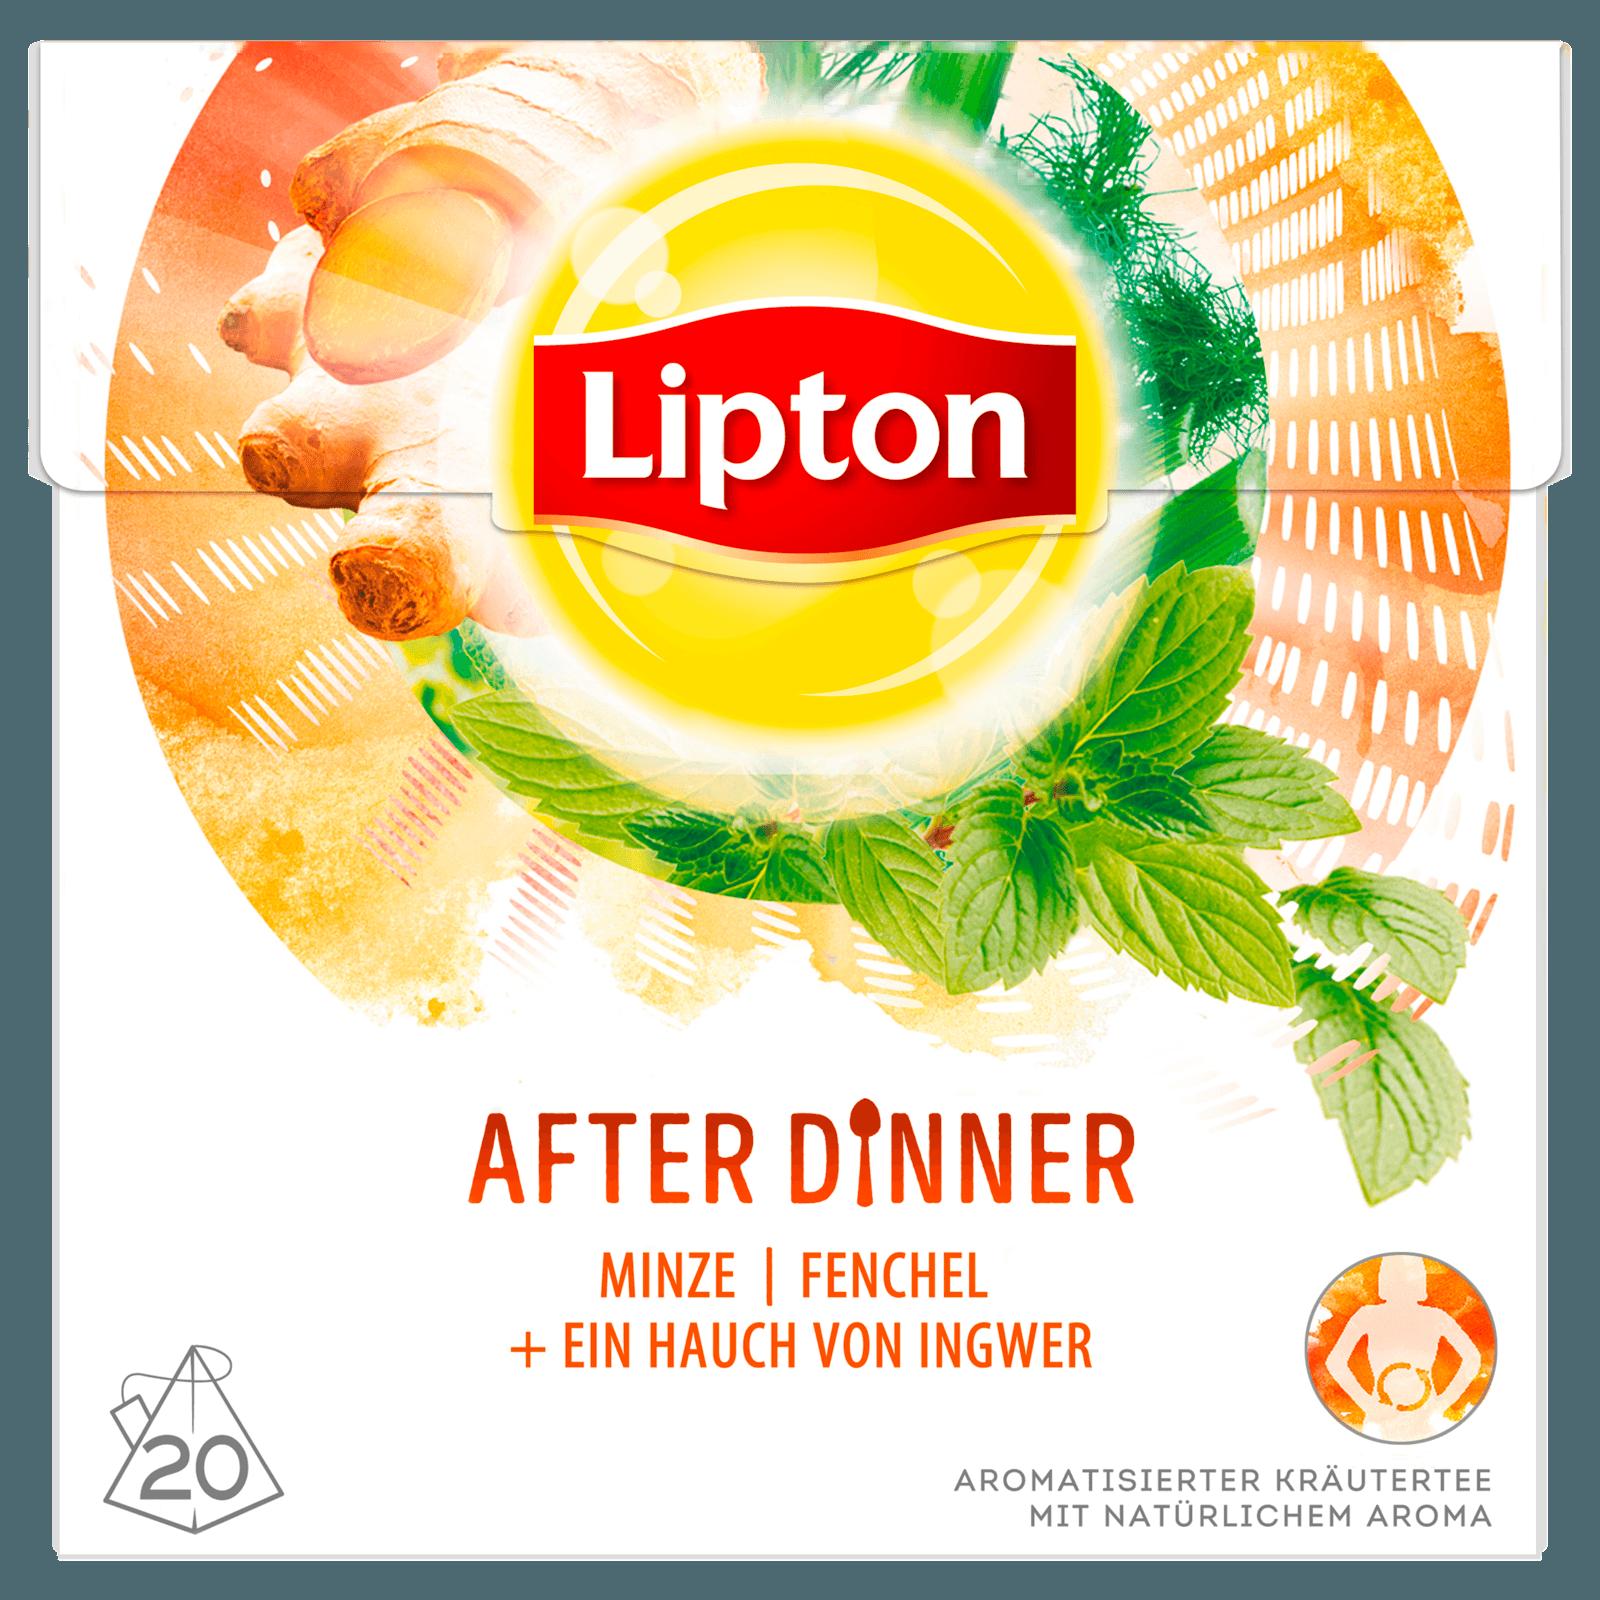 Lipton Kräutertee After Dinner Pyramidenbeutel 30g, 20 Stück